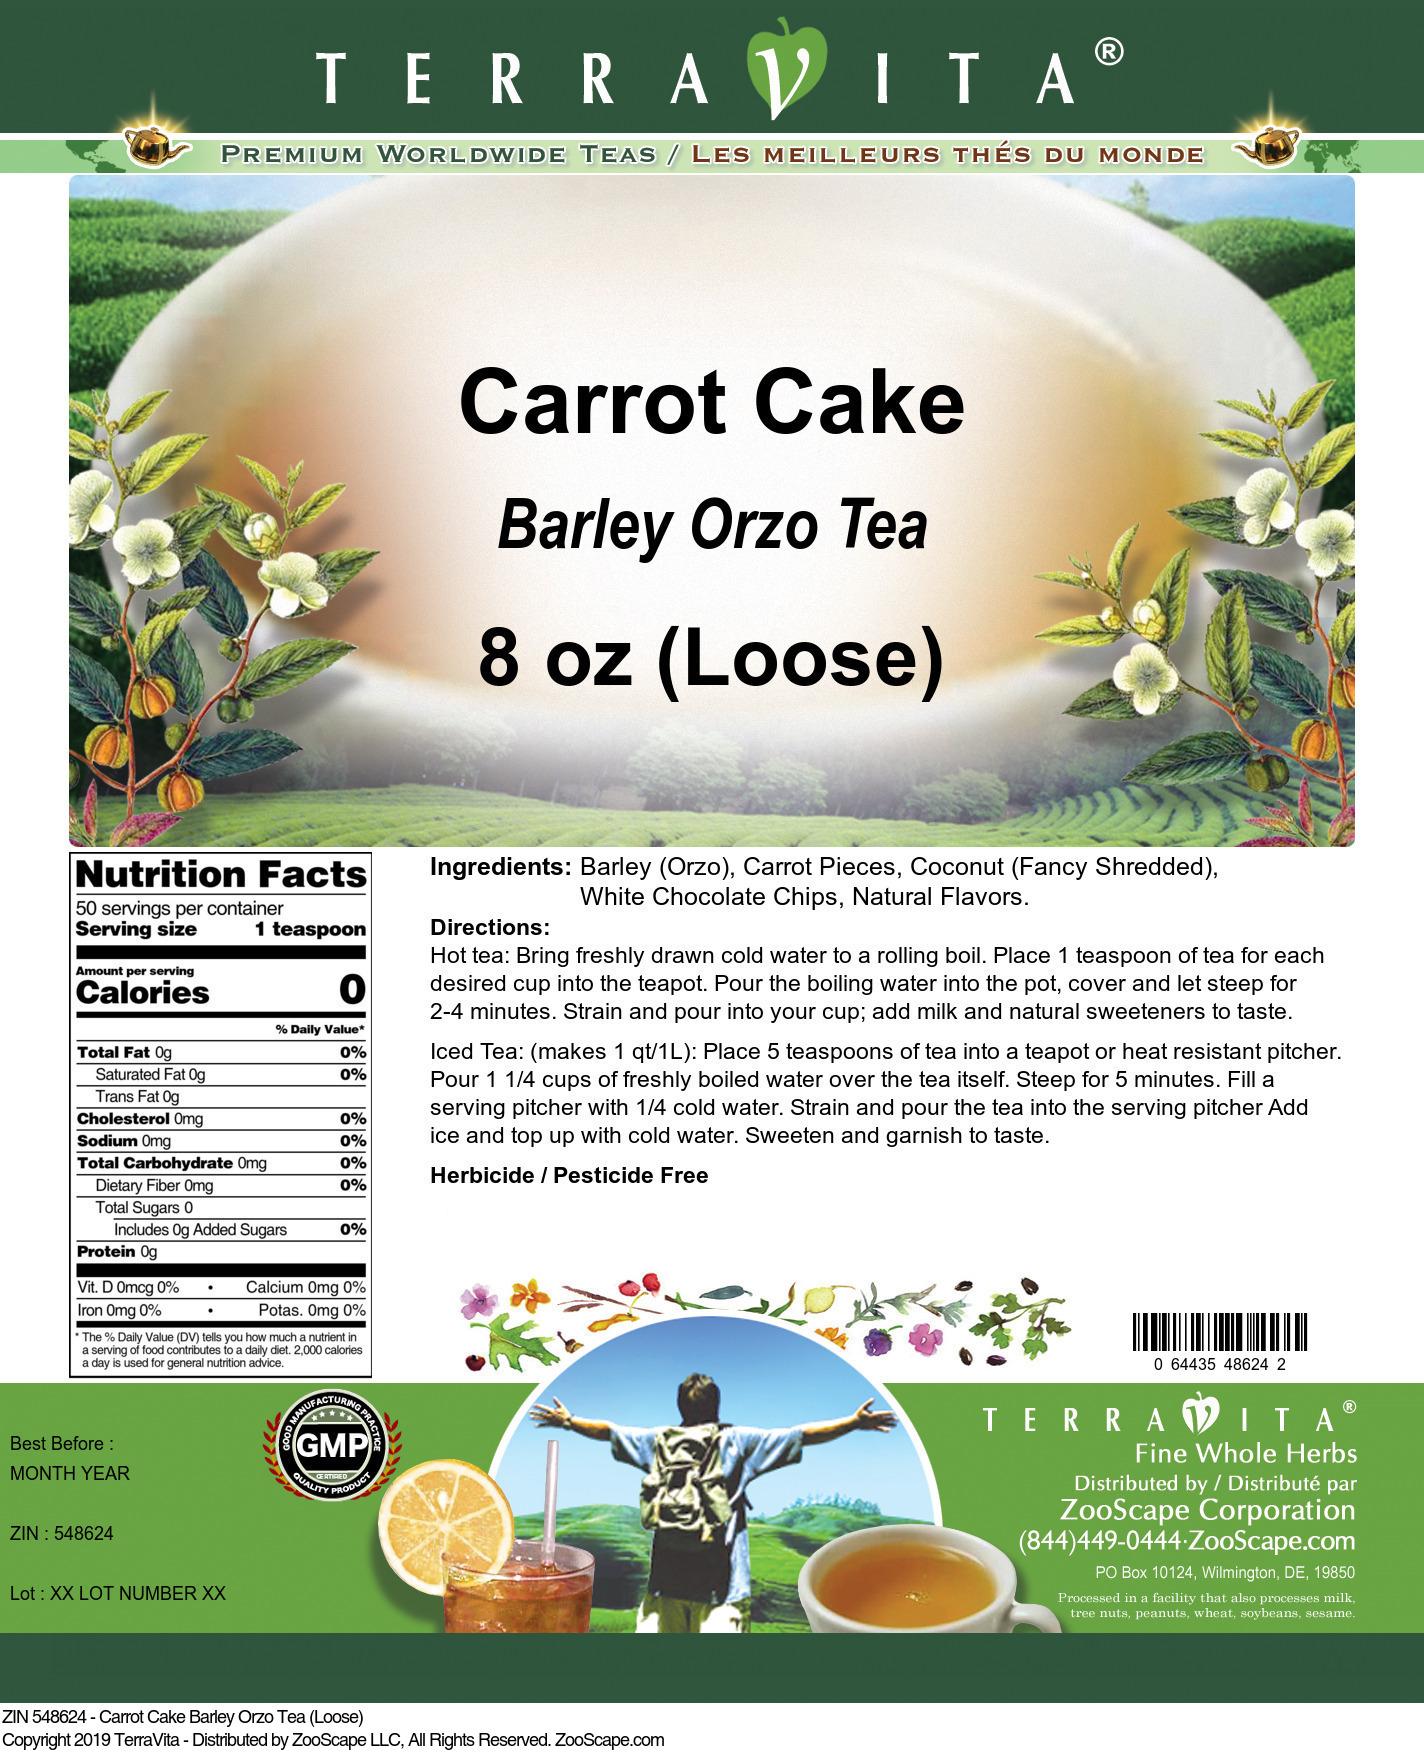 Carrot Cake Barley Orzo Tea (Loose)